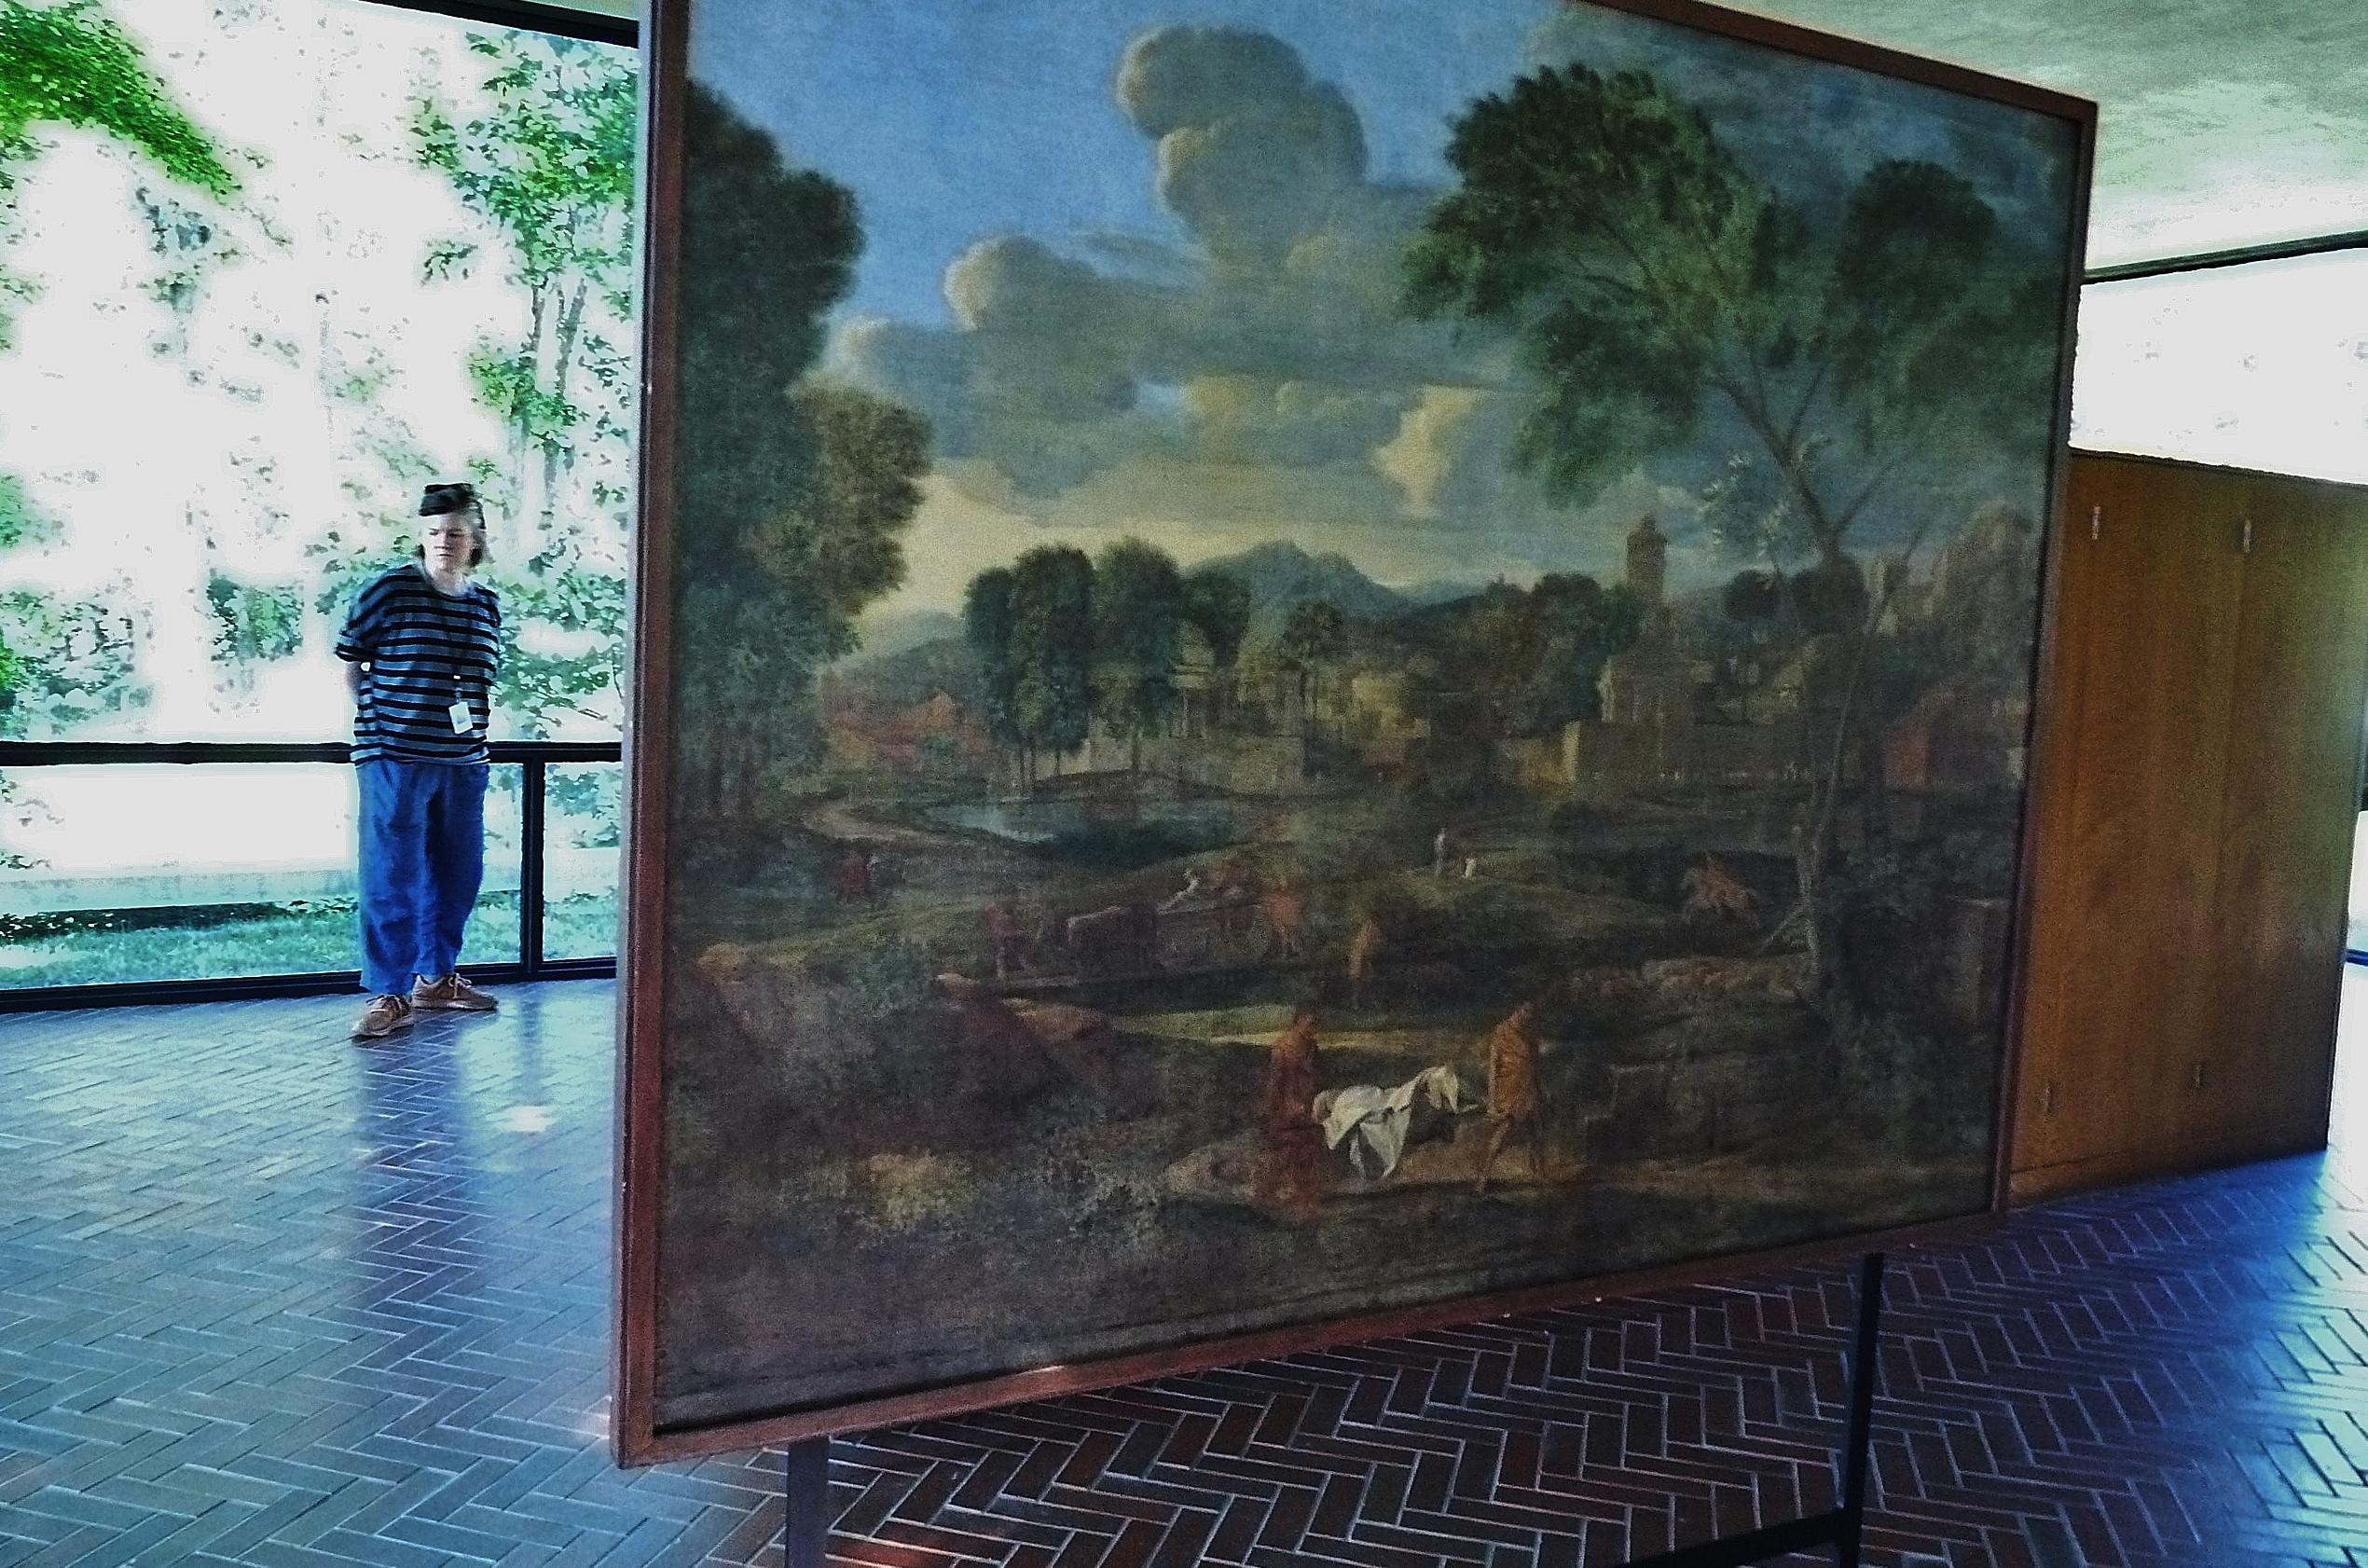 Philip Johnson Glass House file:philip johnson glass house painting - wikimedia commons